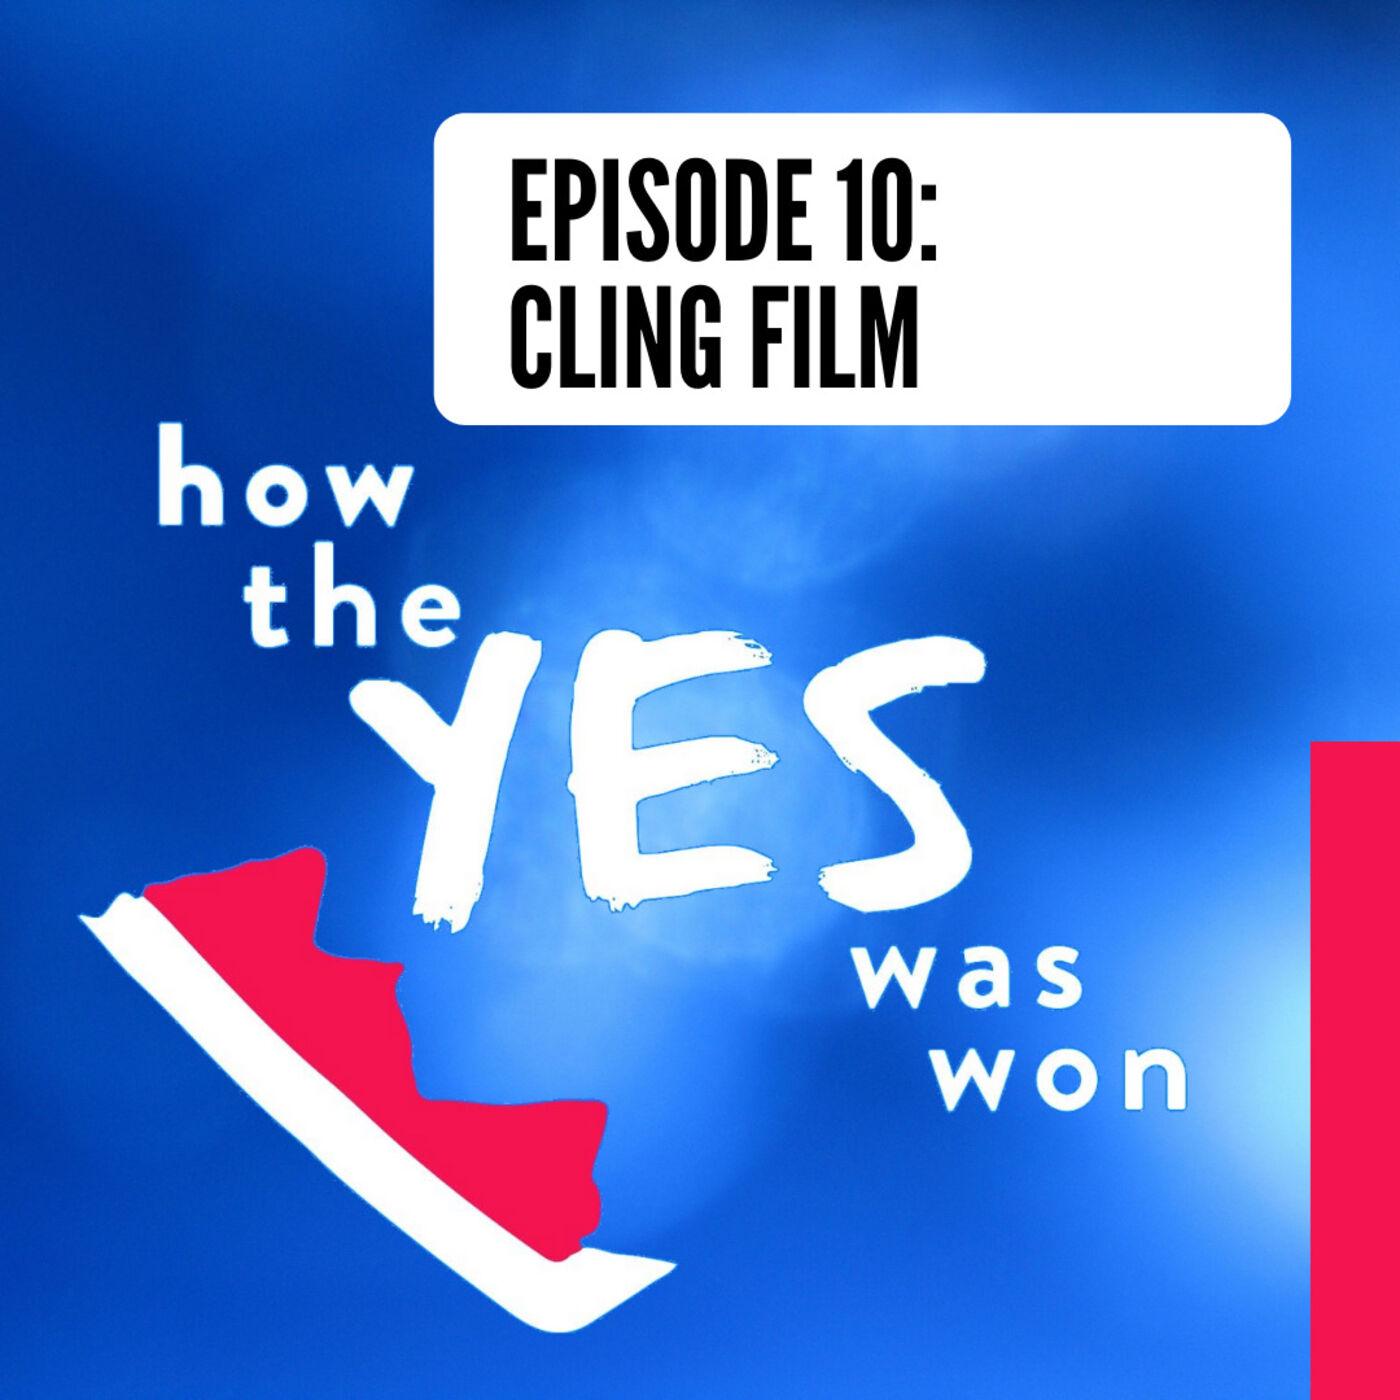 Episode 10: Cling Film